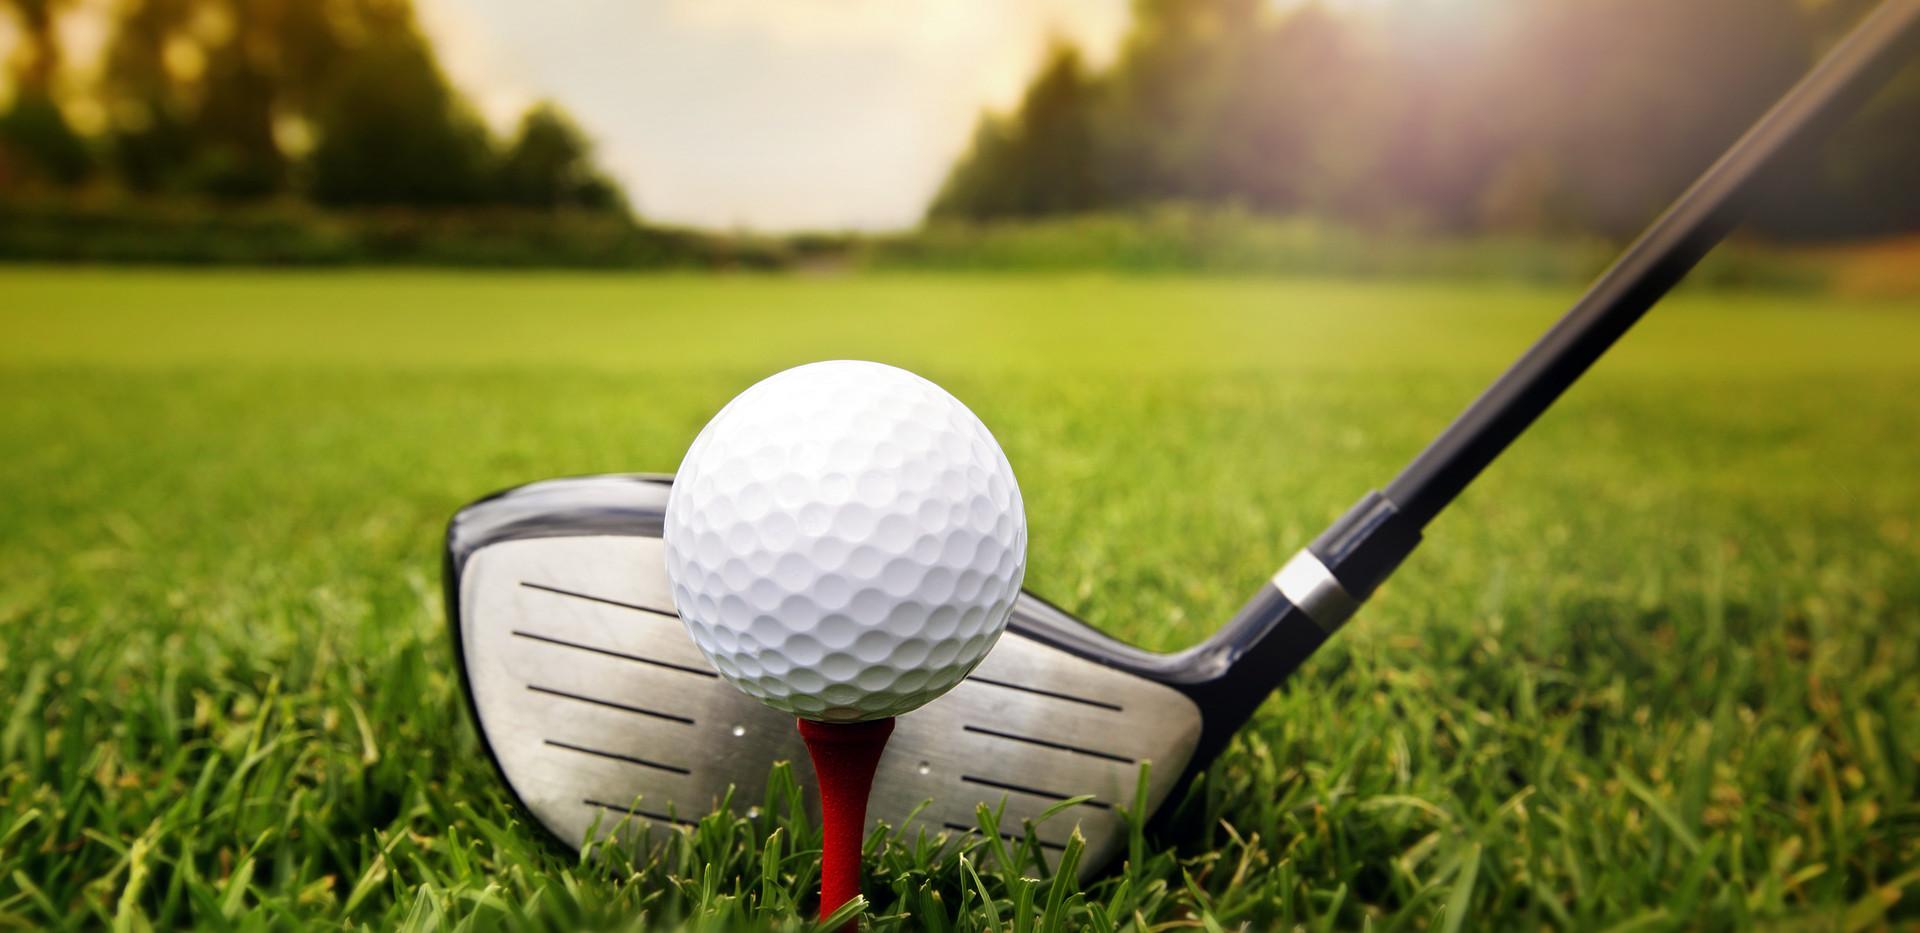 Golf club and ball in grass.jpg